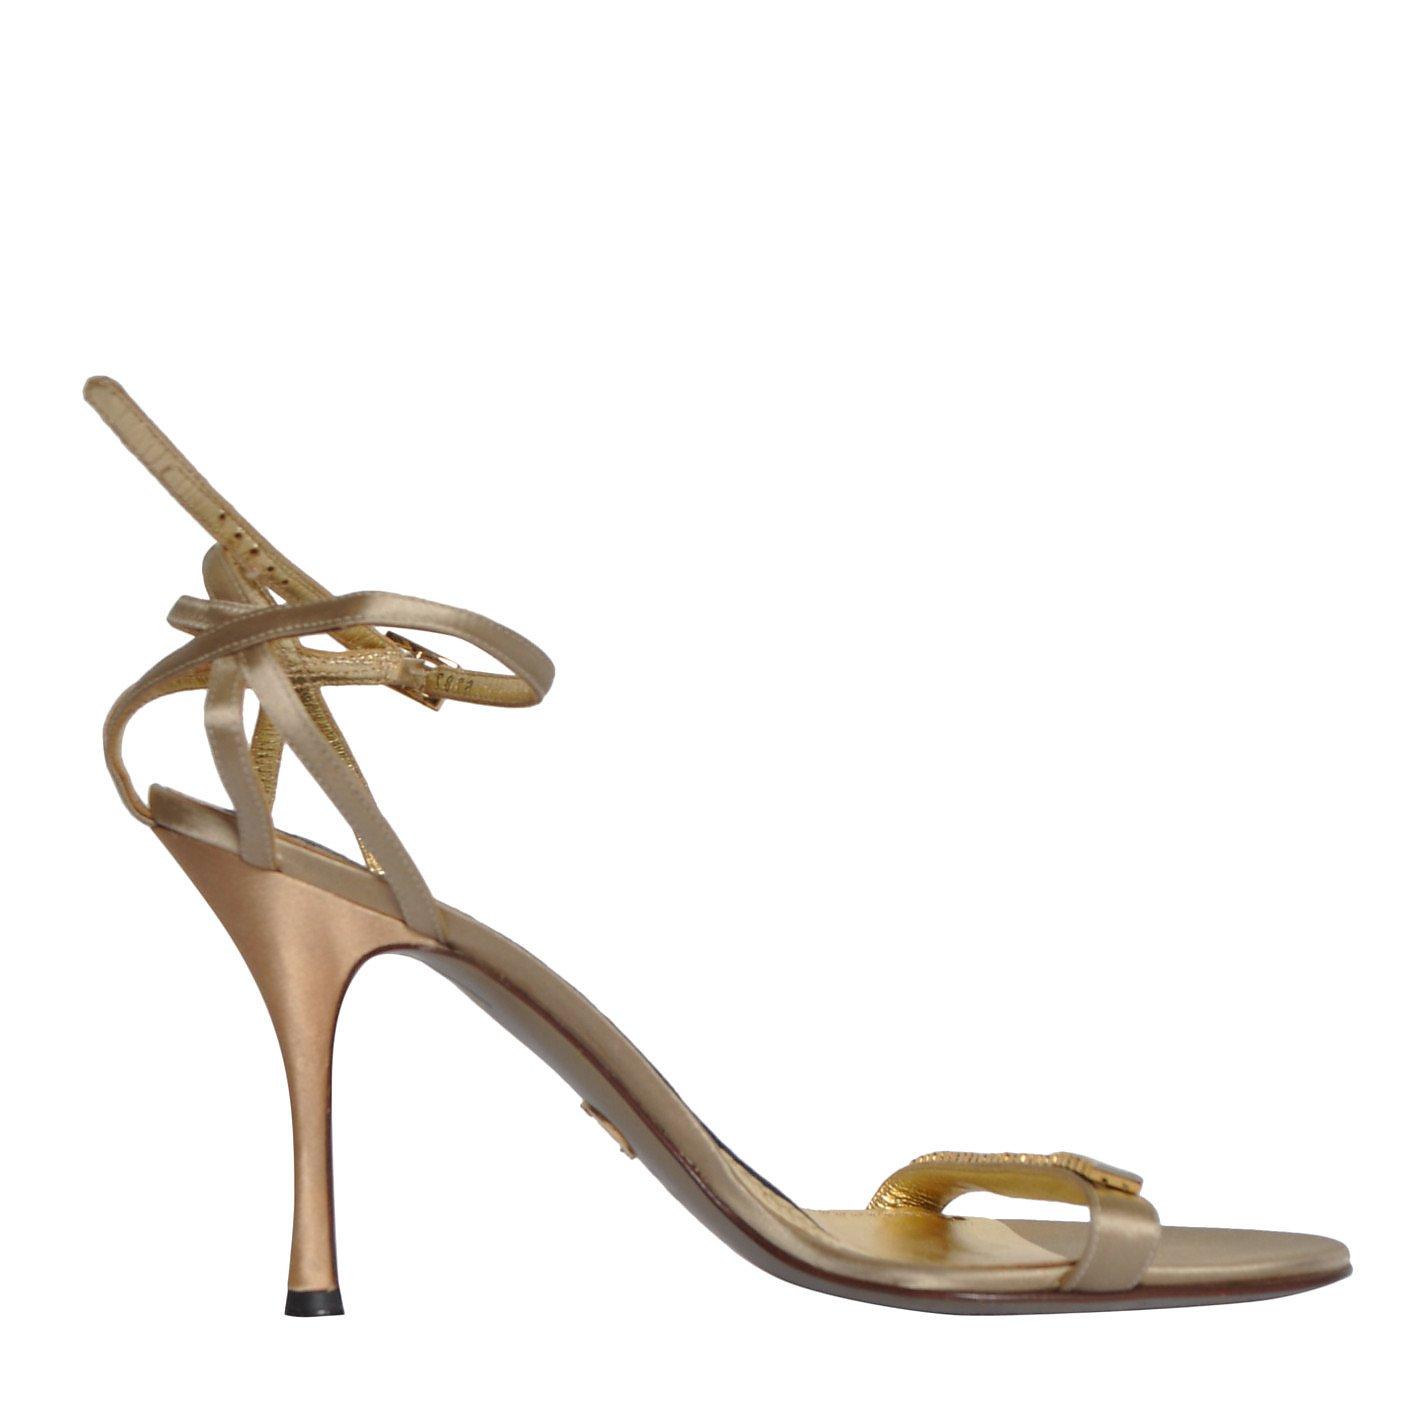 DOLCE & GABBANA Metallic Embellished Sandals